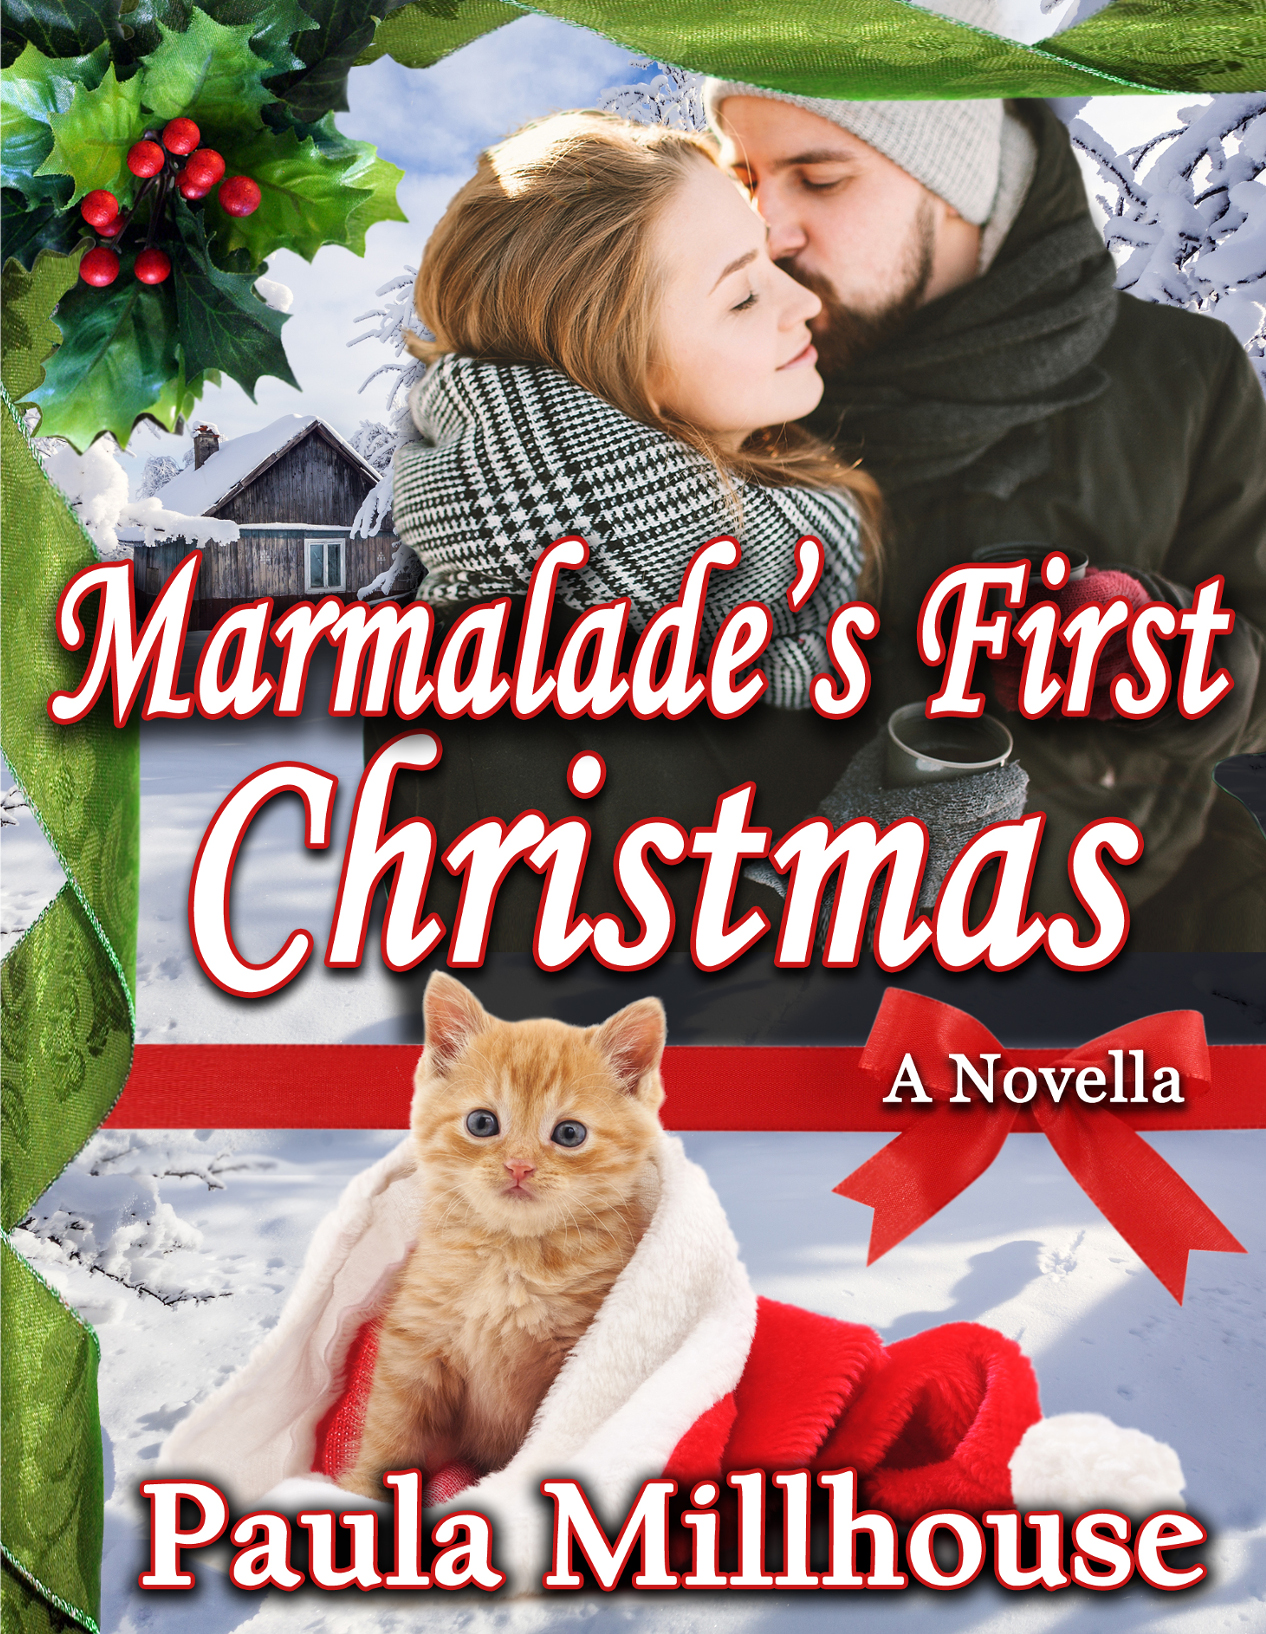 Author Paula Millhouse, Marmalade's First Christmas, Contemporary Romance, Holidays, Kitten, Love, season, giving, hot chocolate recipe